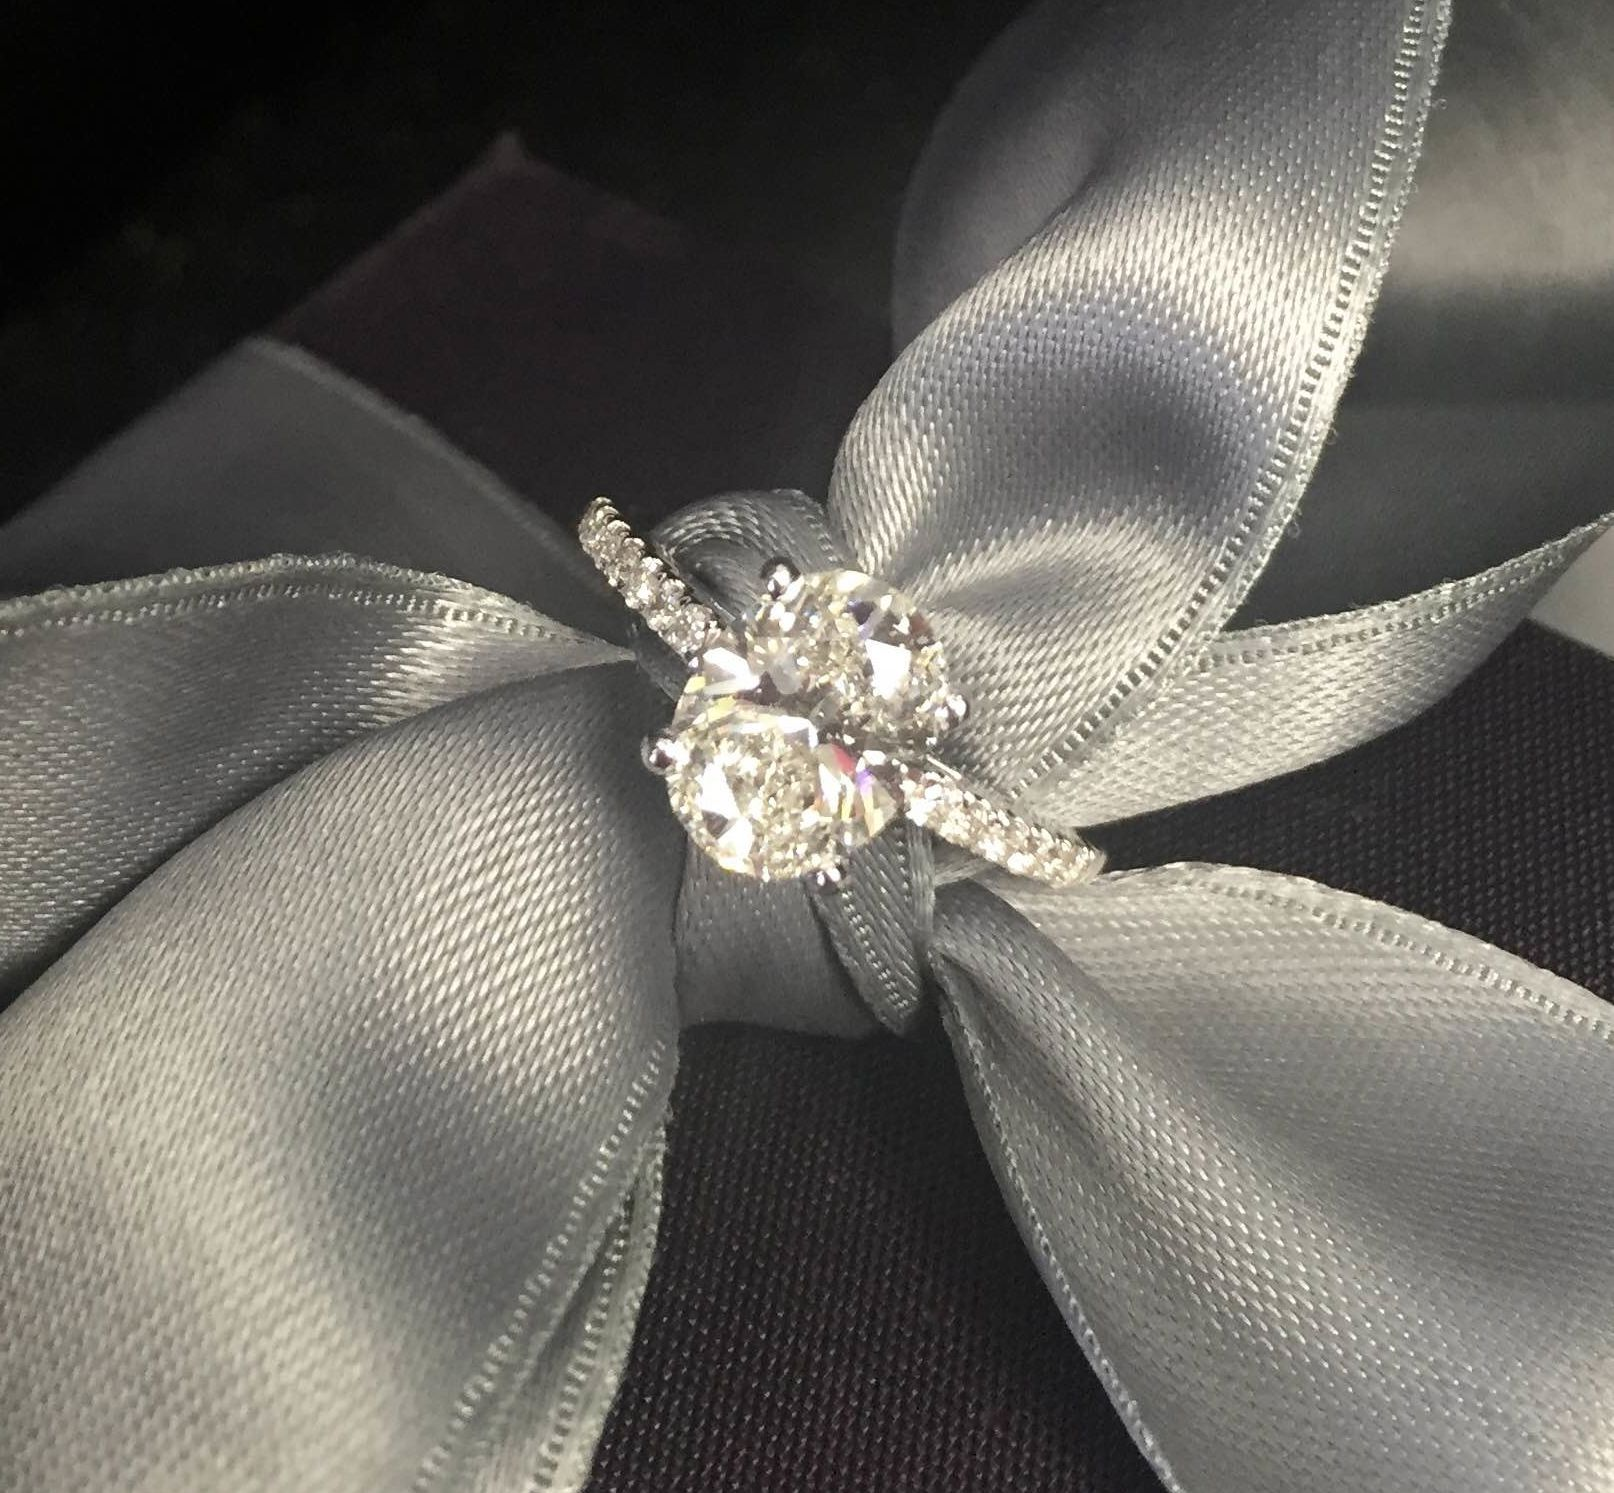 Oval Diamond Engagement Ring from Rothschild Diamond!